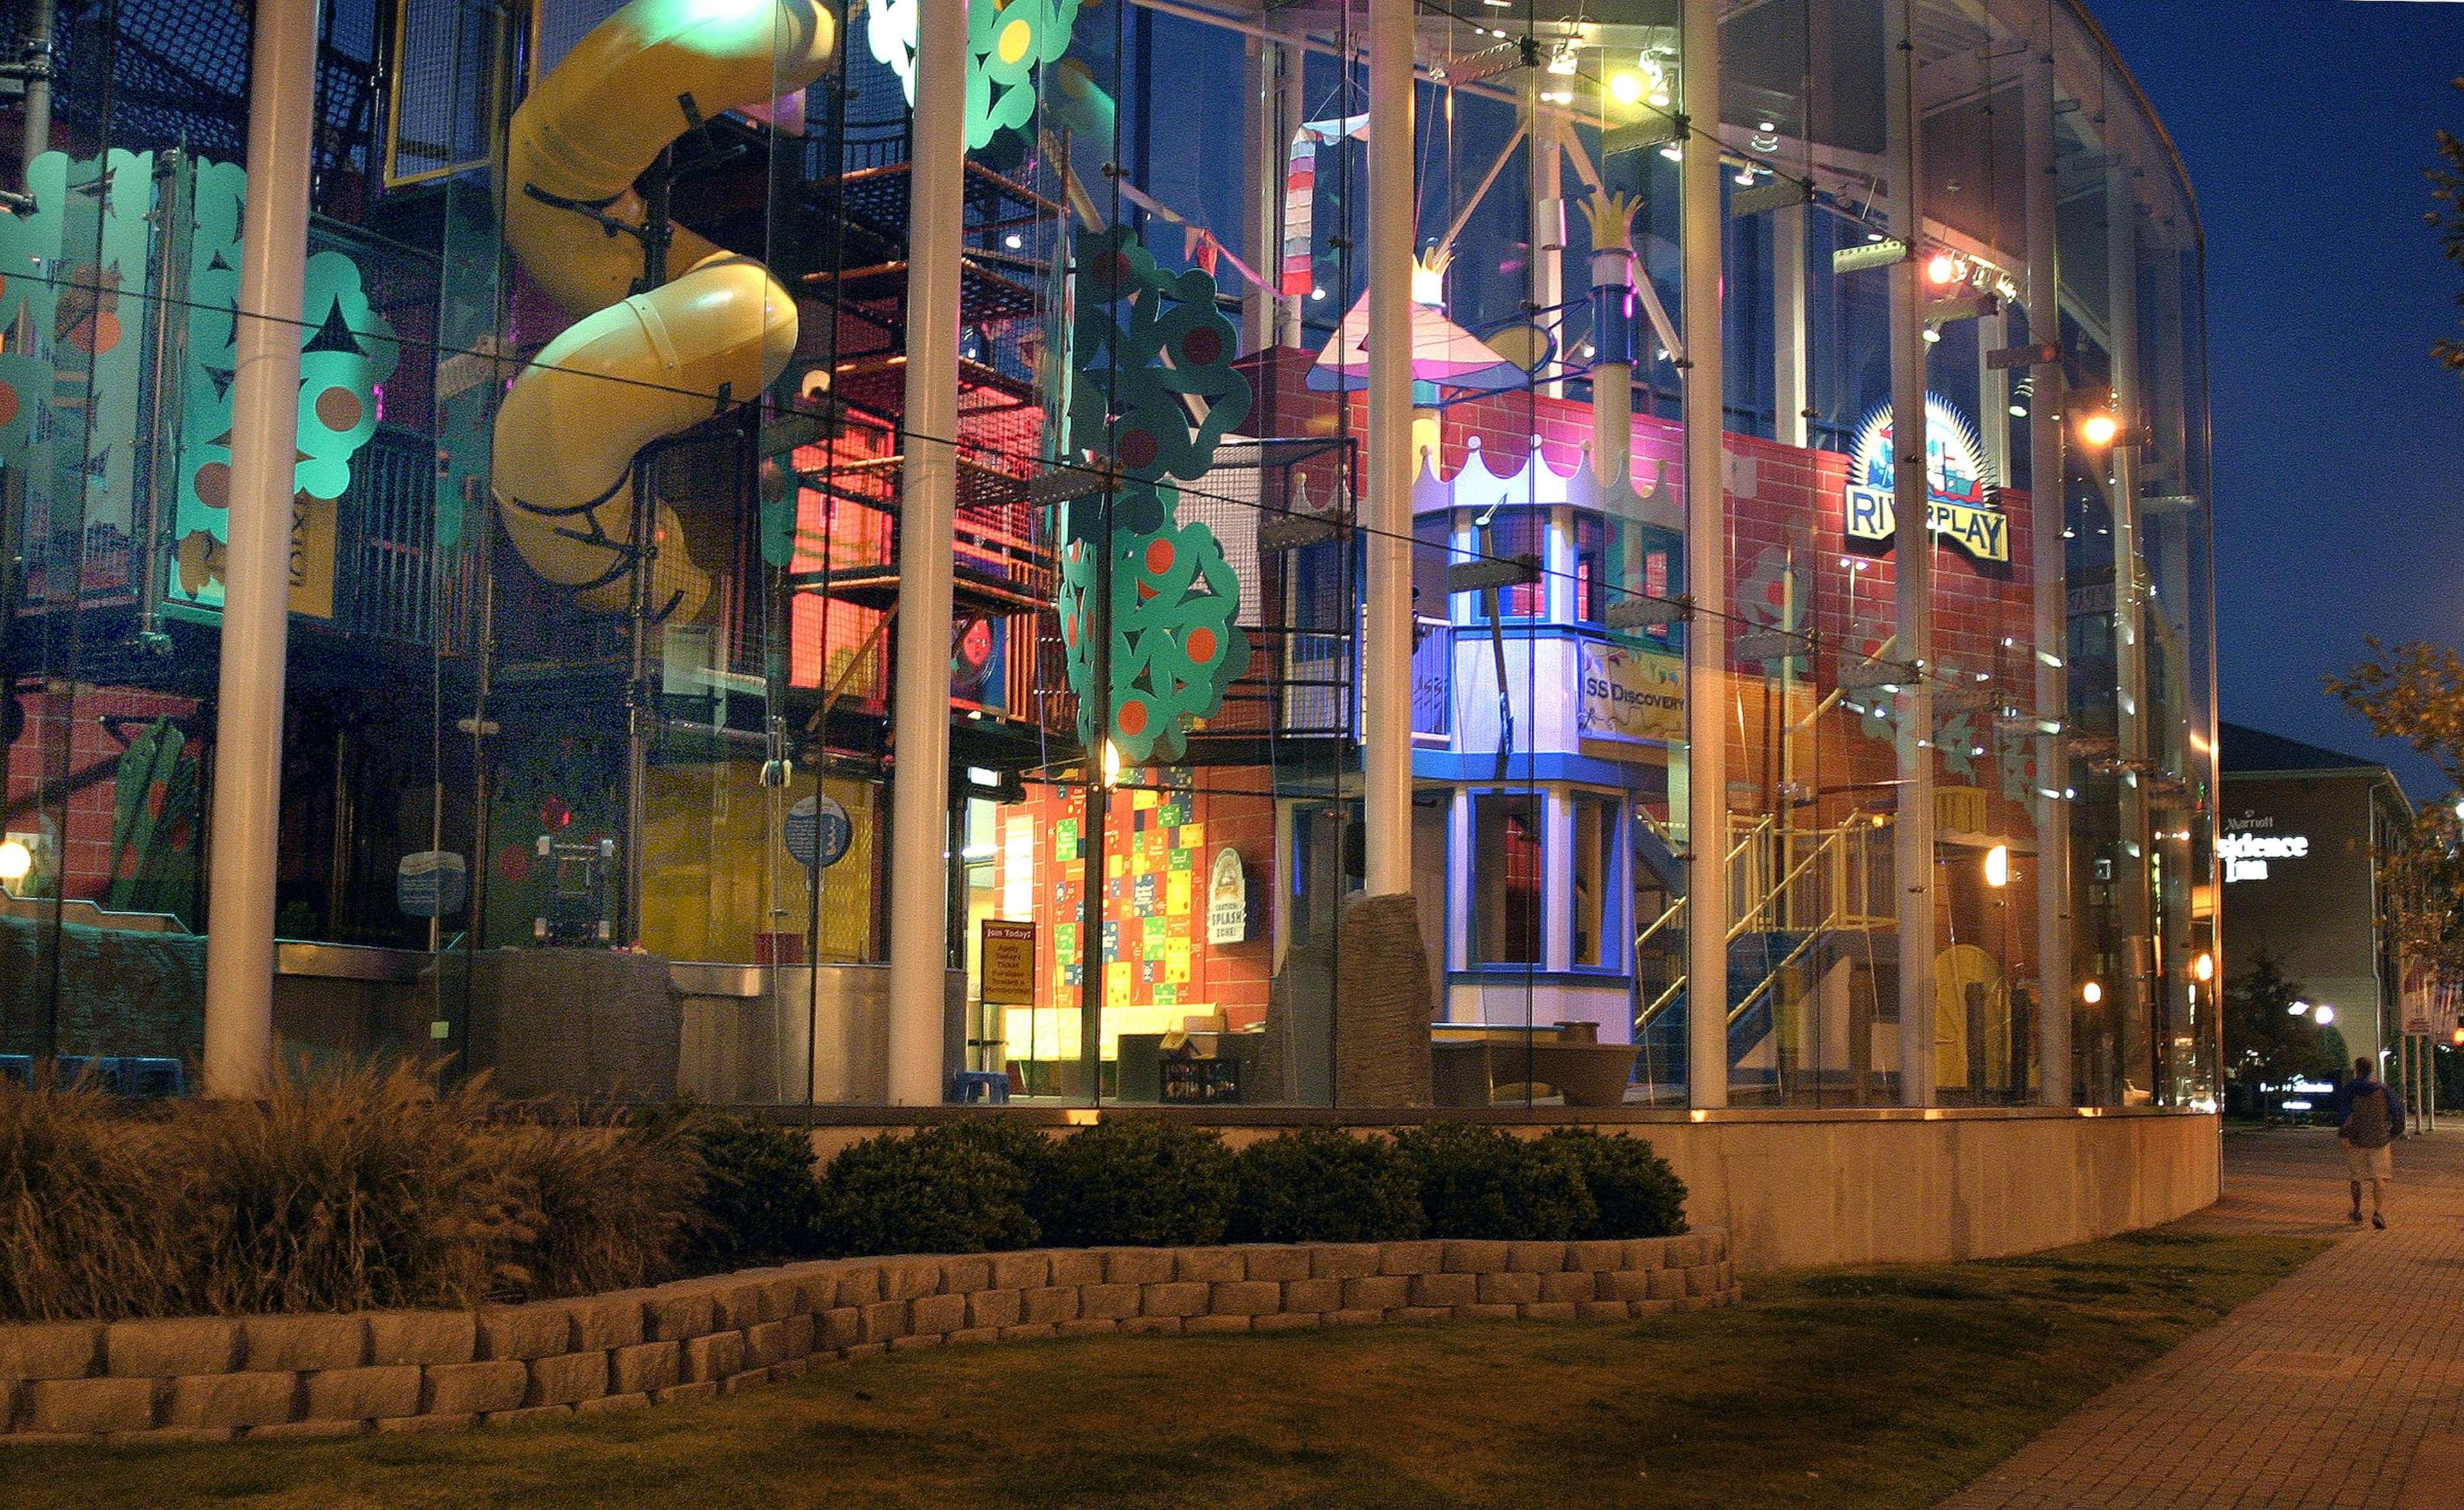 Hilton Garden Inn Chattanooga Downtown 311 Chestnut Street ...